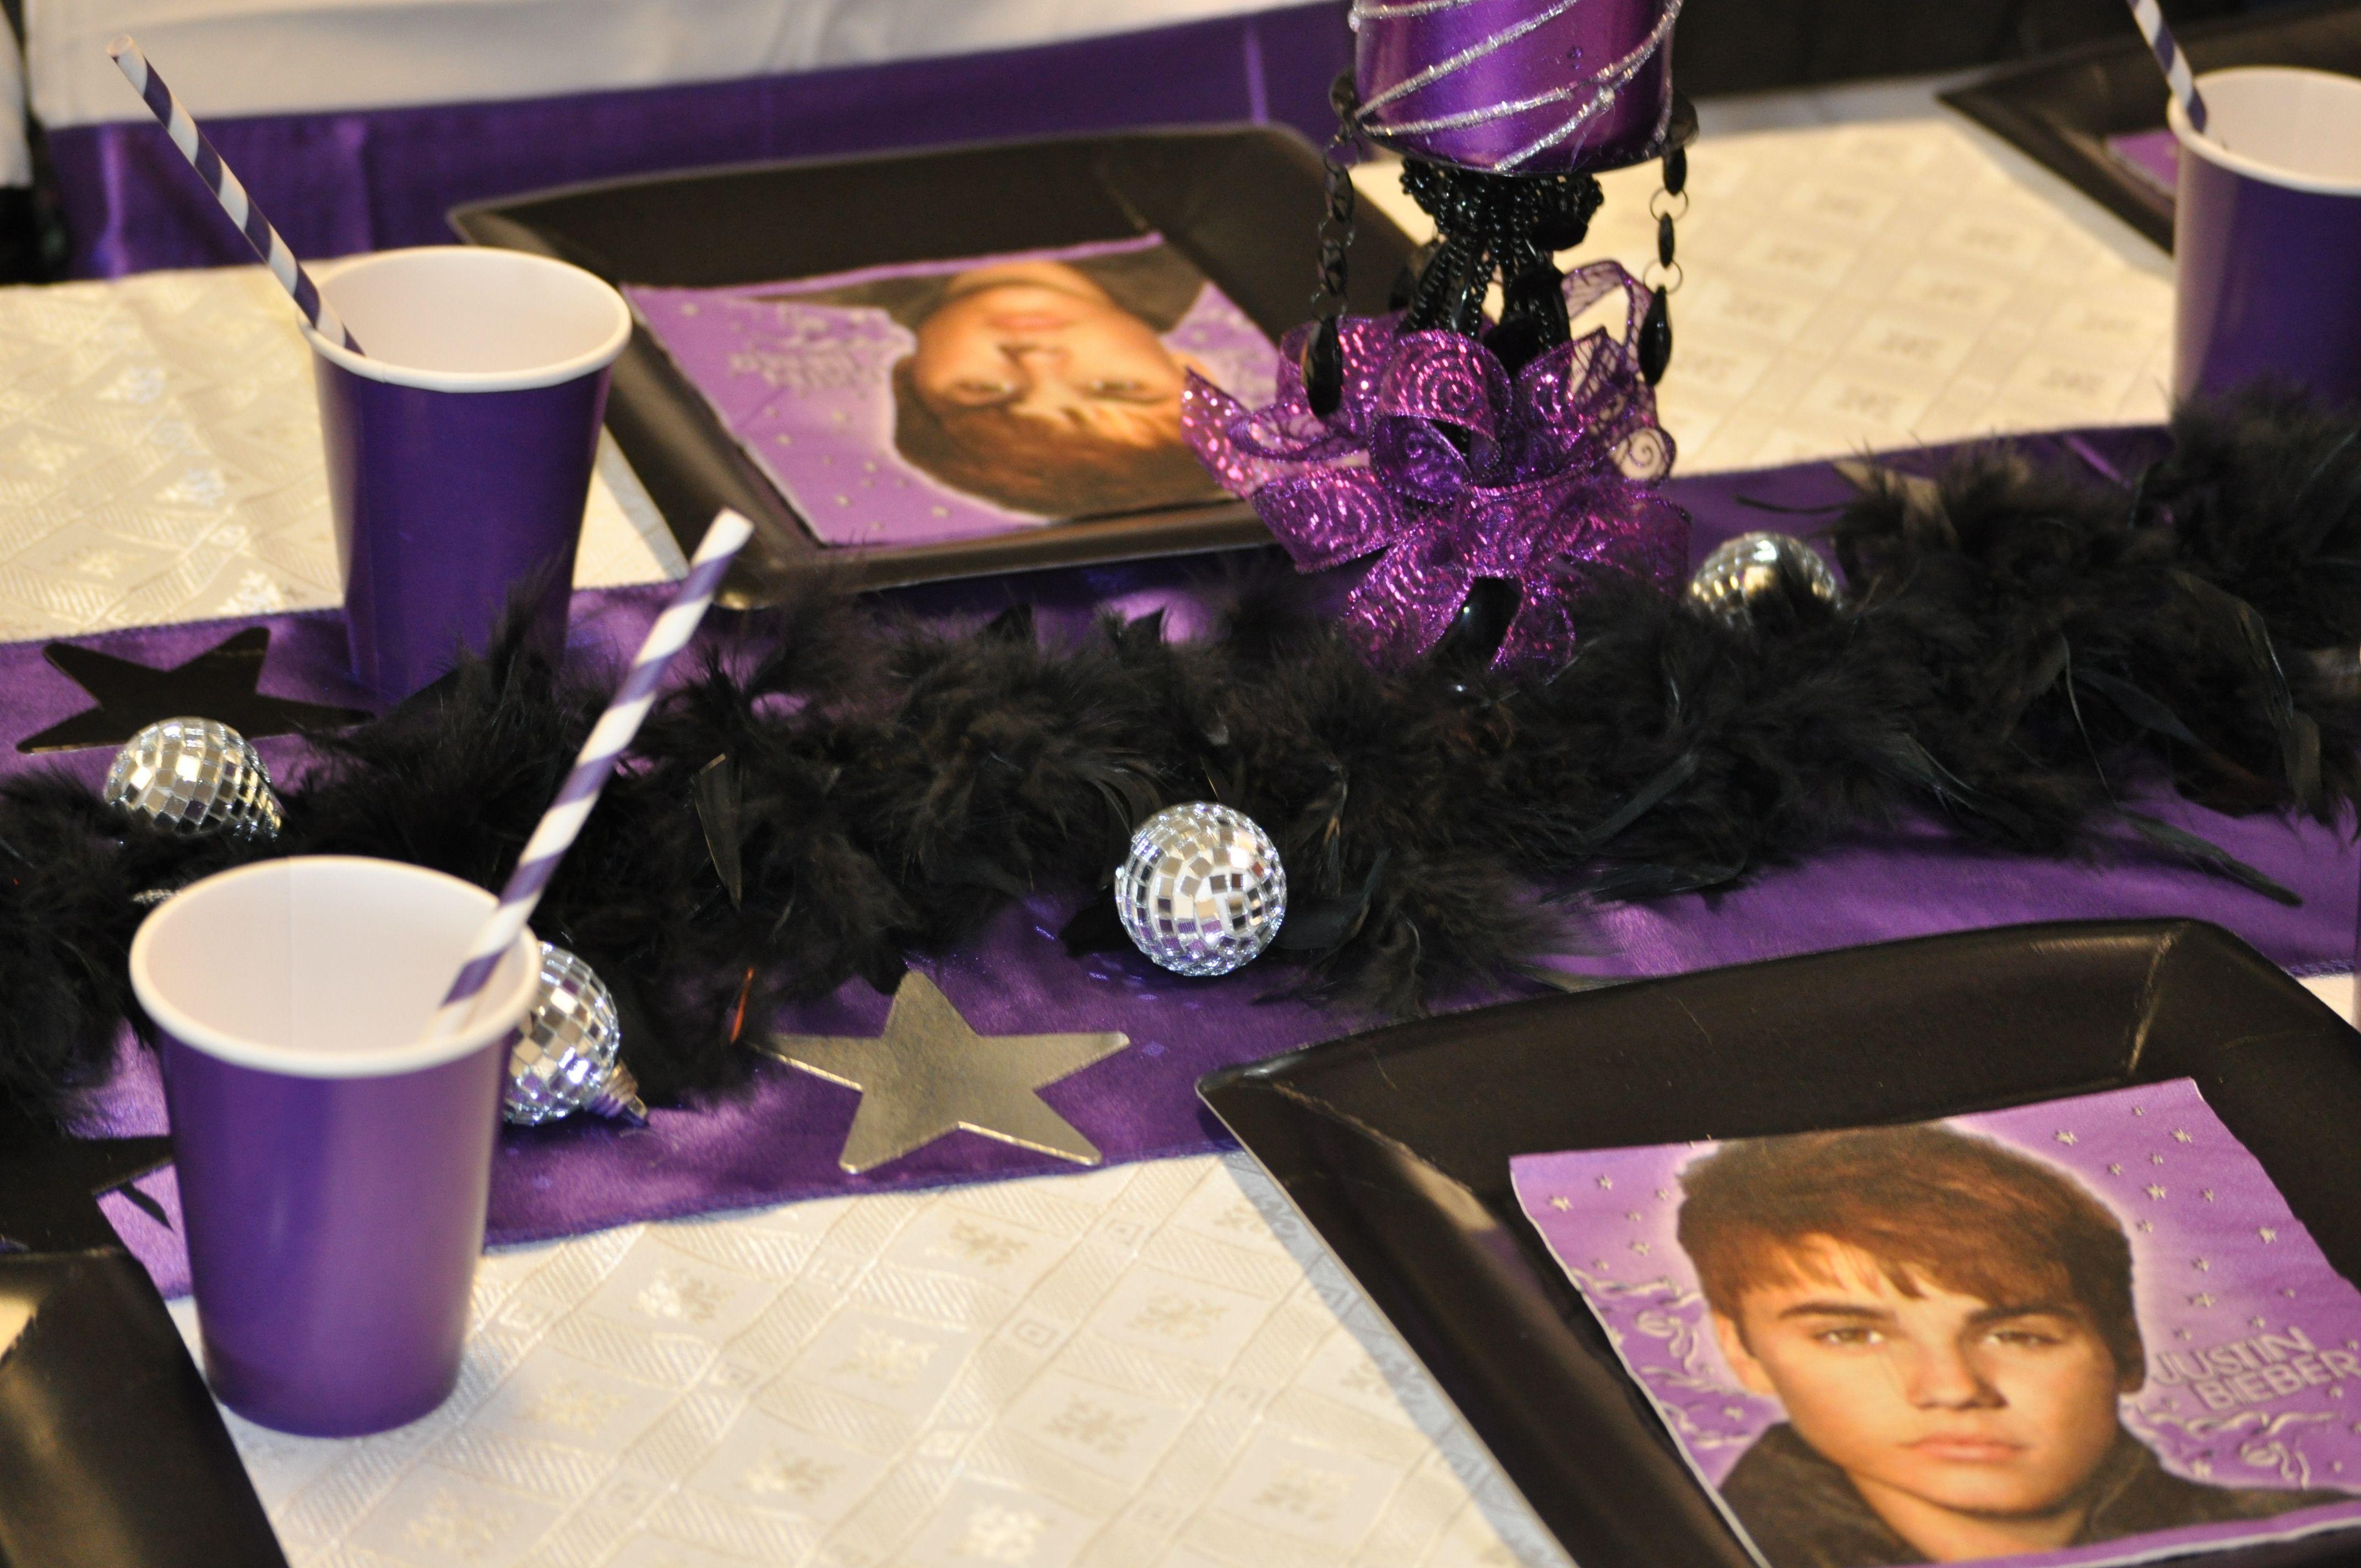 Justin Bieber / Rockstar party black, purple, silver & white table setting